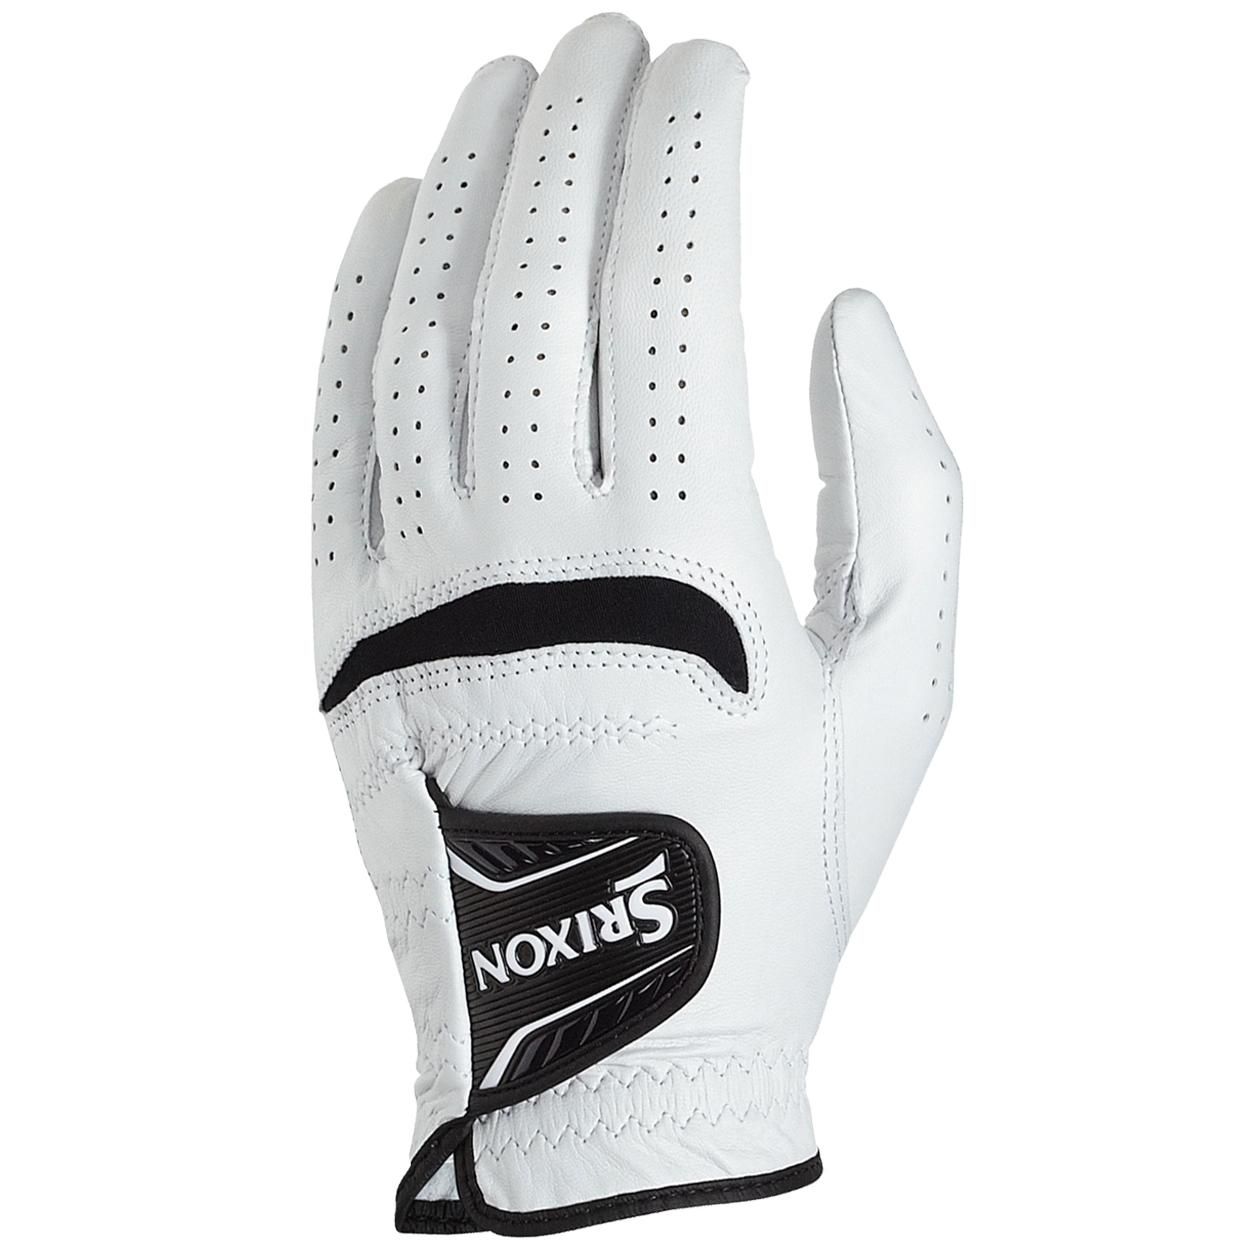 Black leather golf gloves - Srixon Men 039 S Cabretta Leather Golf Gloves